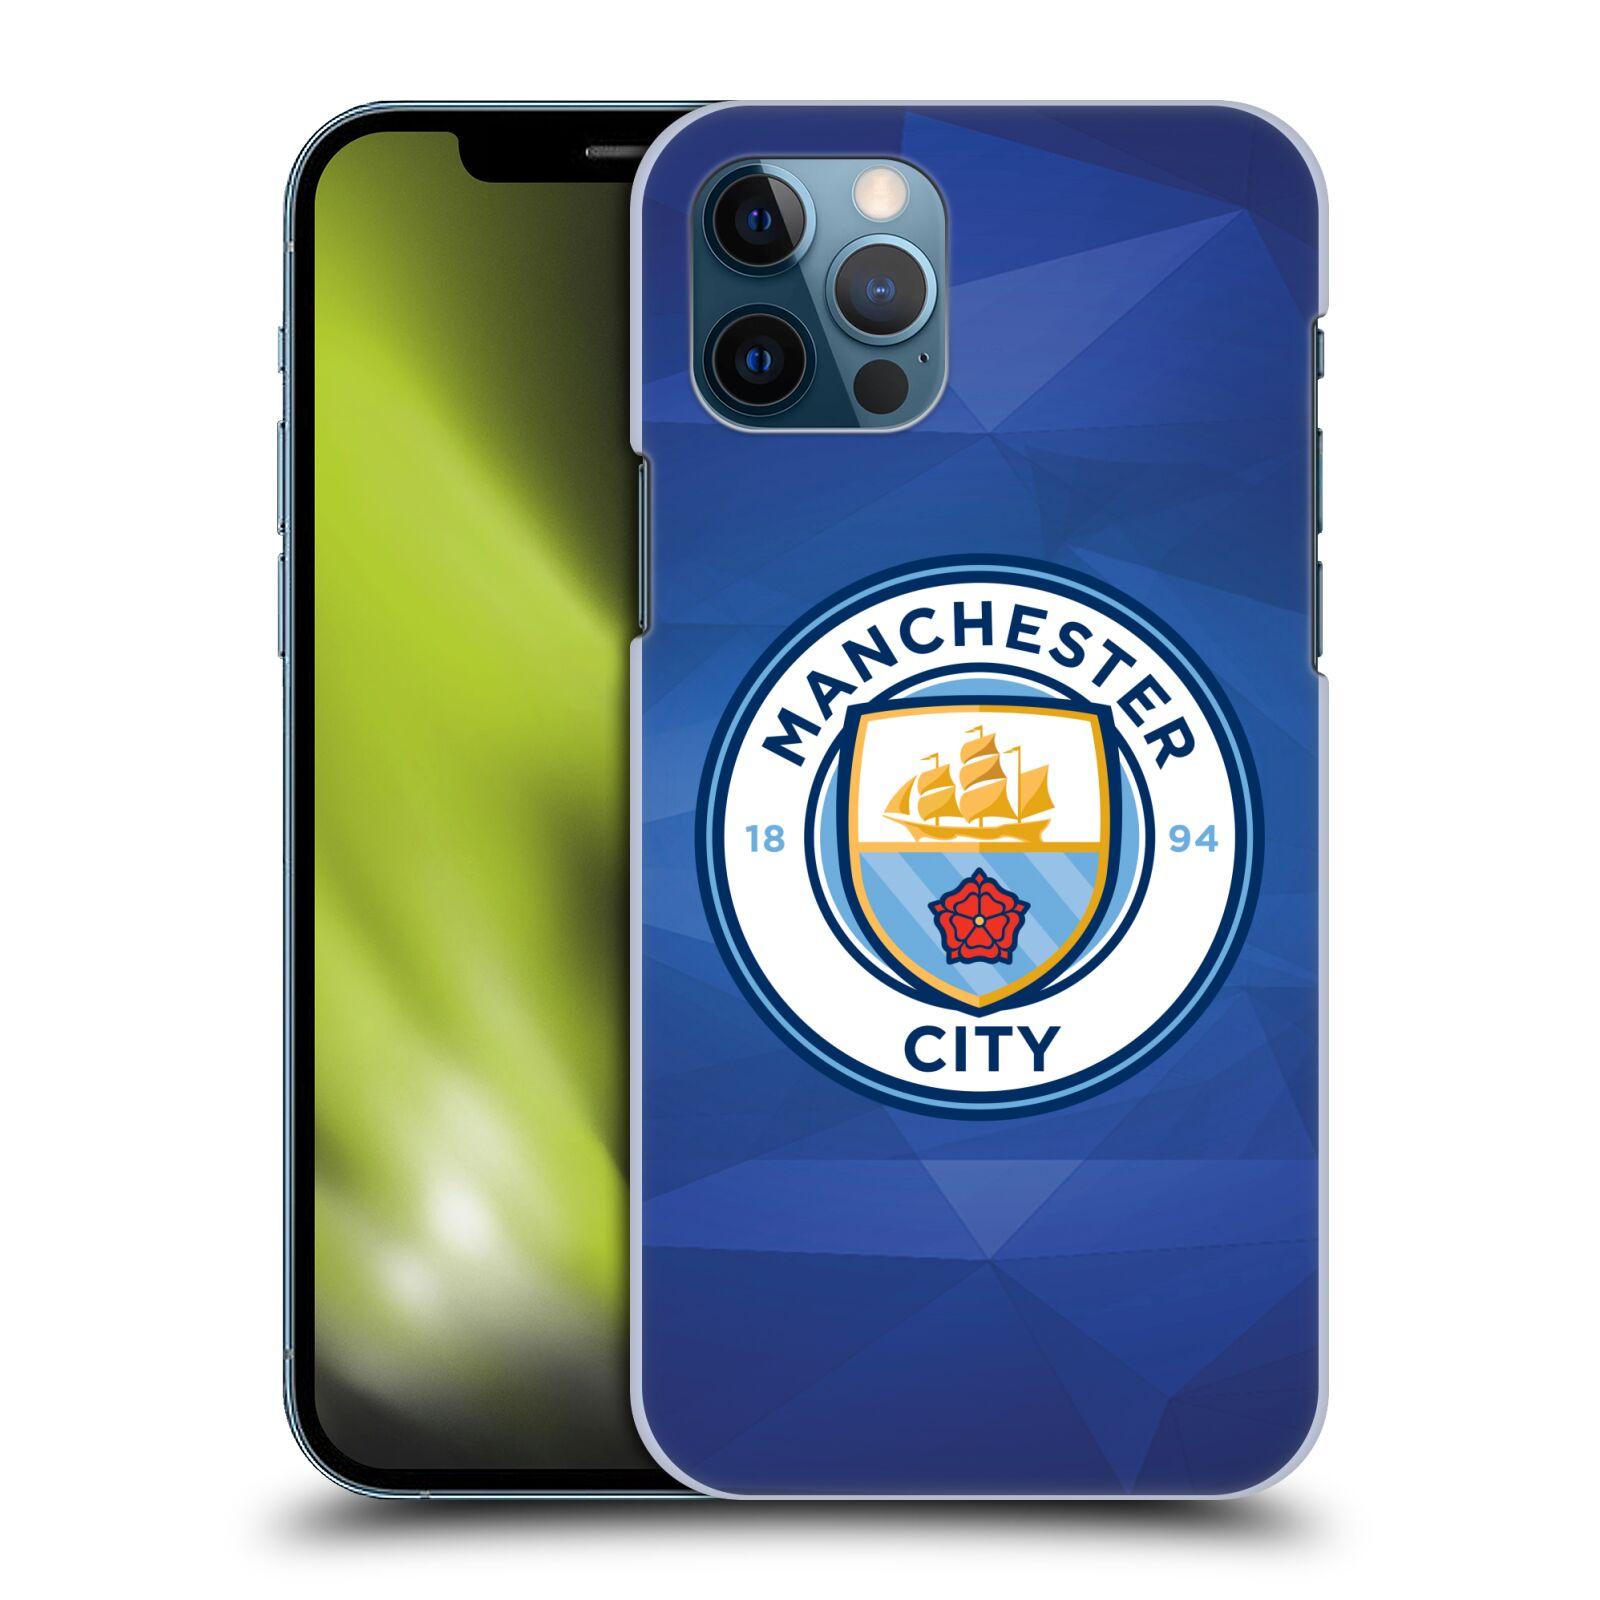 Plastové pouzdro na mobil Apple iPhone 12 / 12 Pro - Head Case - Manchester City FC - Modré nové logo